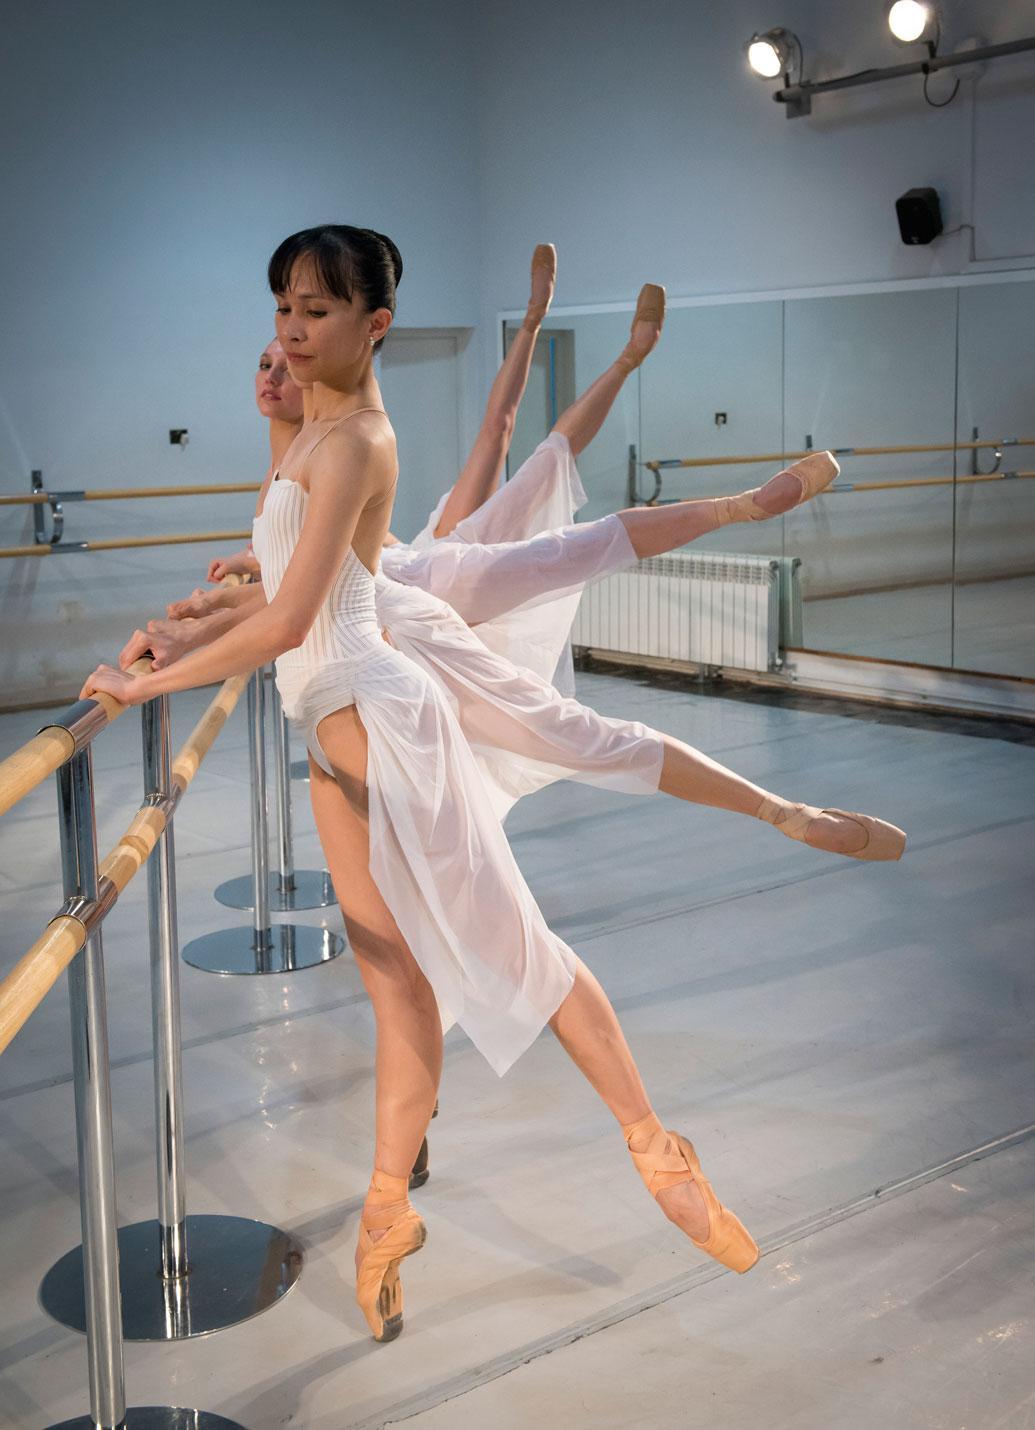 Foto 12 de Escuelas de música, danza e interpretación en Barcelona | Escola de Ballet Clàssic David Campos